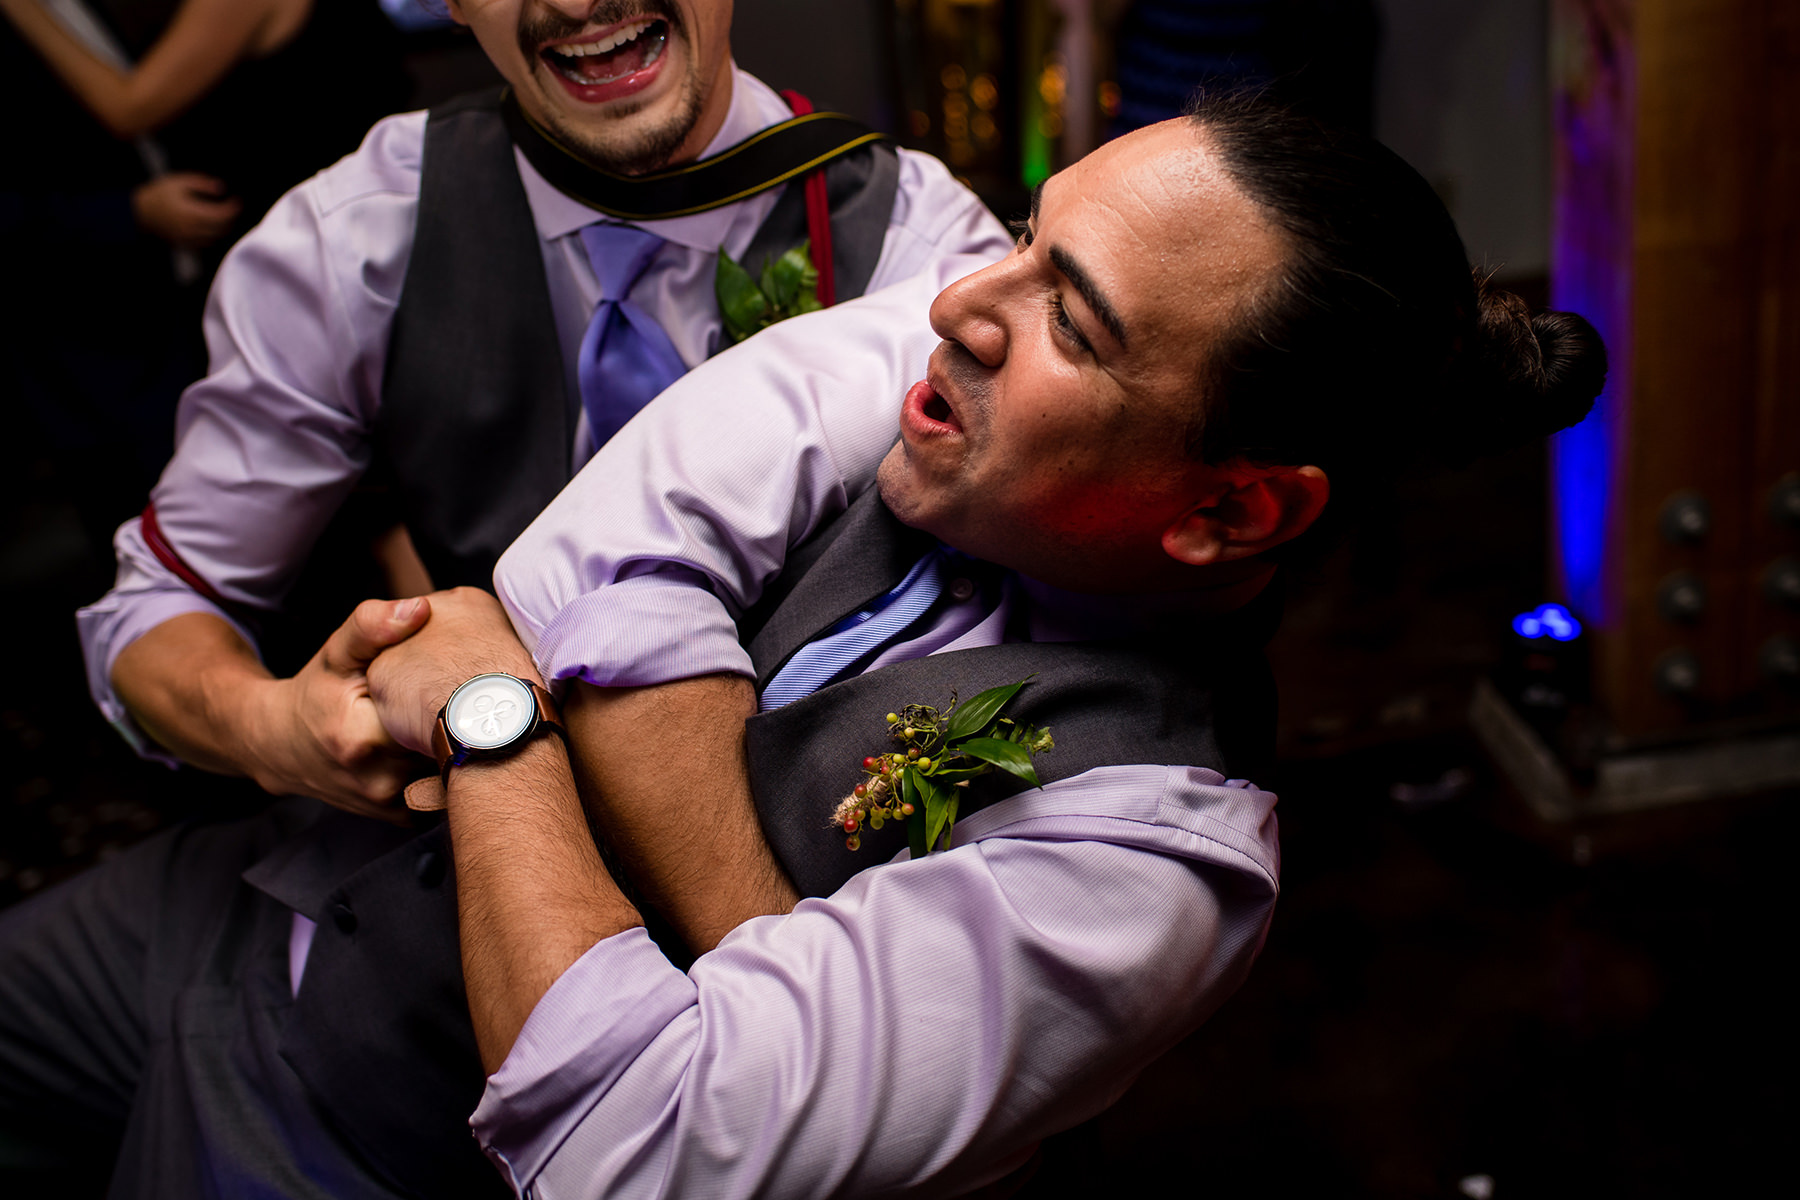 groomsmen dancing together